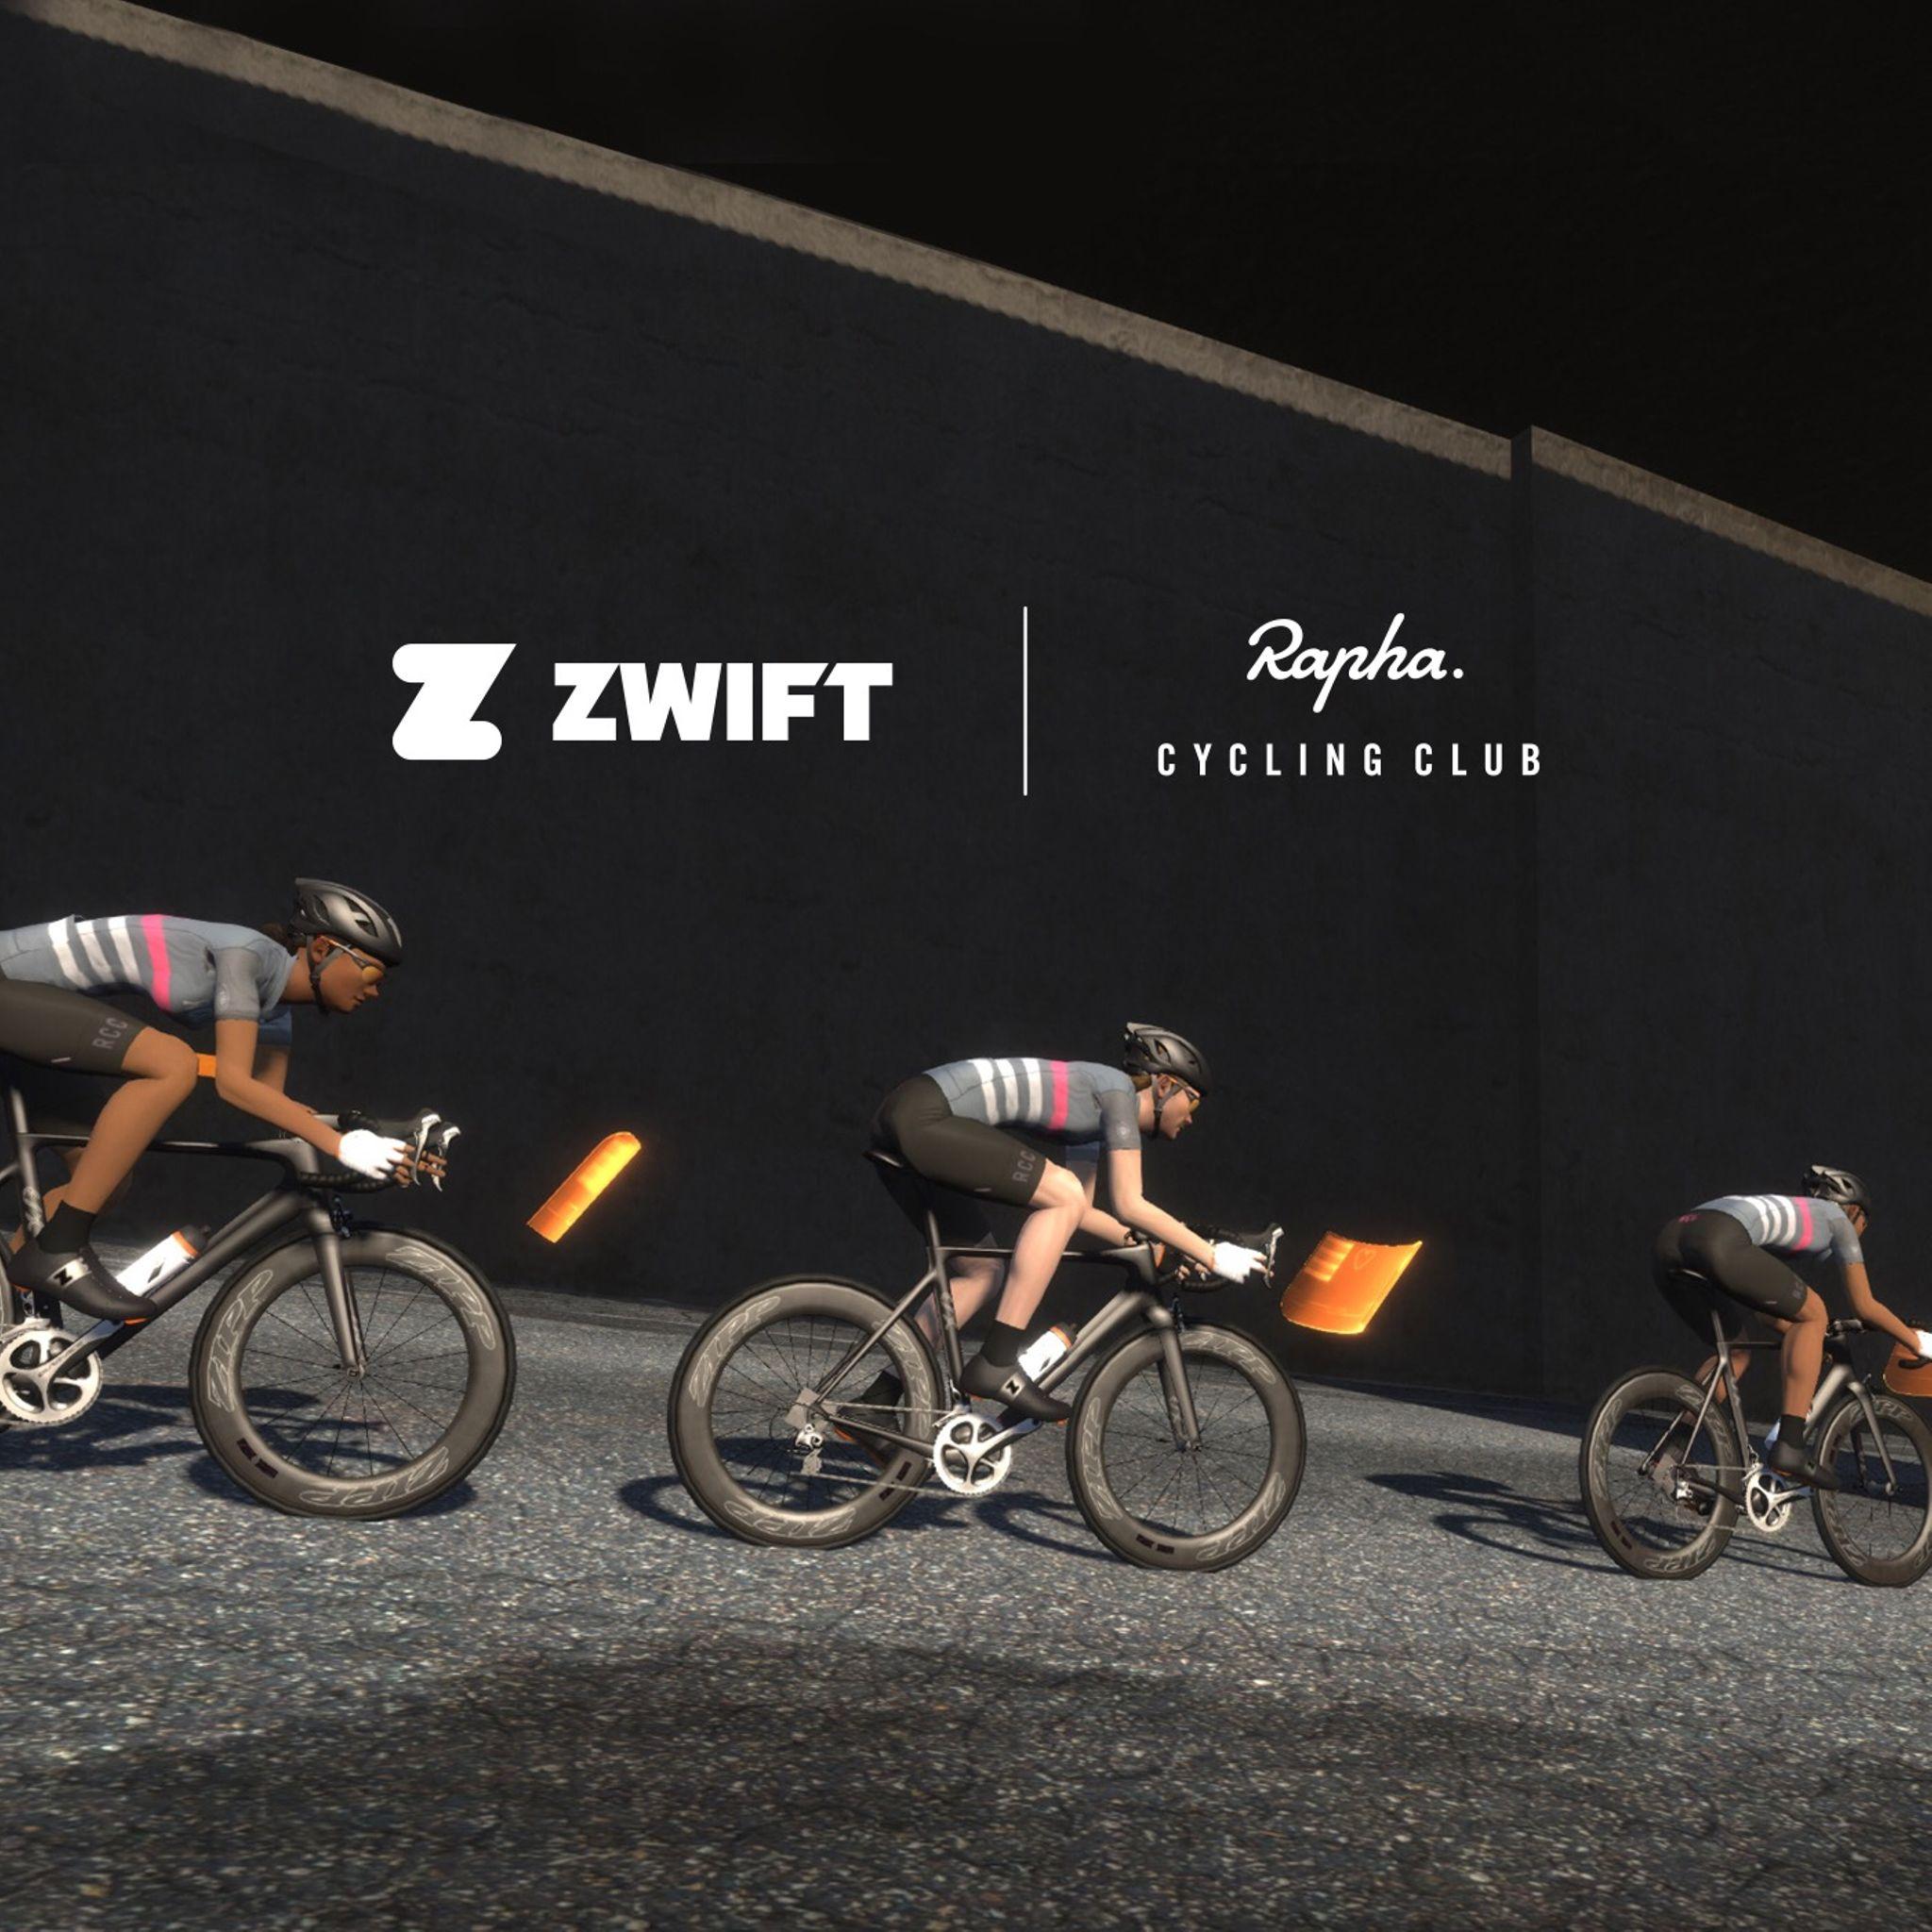 Rapha Cycling Club x Zwift Training Camp | A post by Zwift on Strava